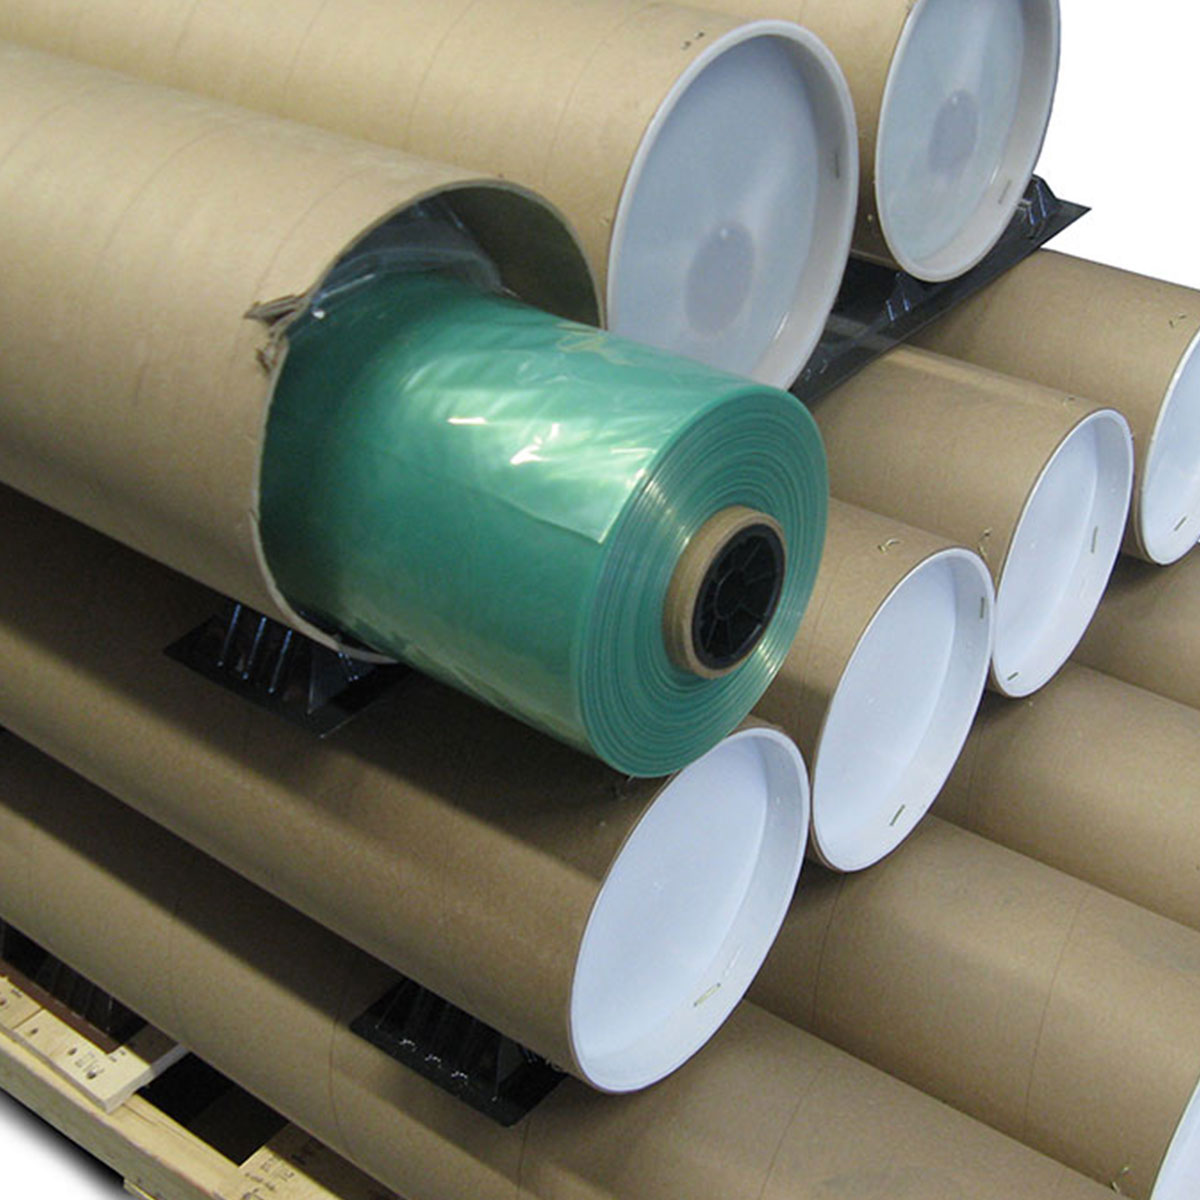 vakuum sack nylon 1200 grn lft 0050mm x 1200mm 720m 0002 x 48